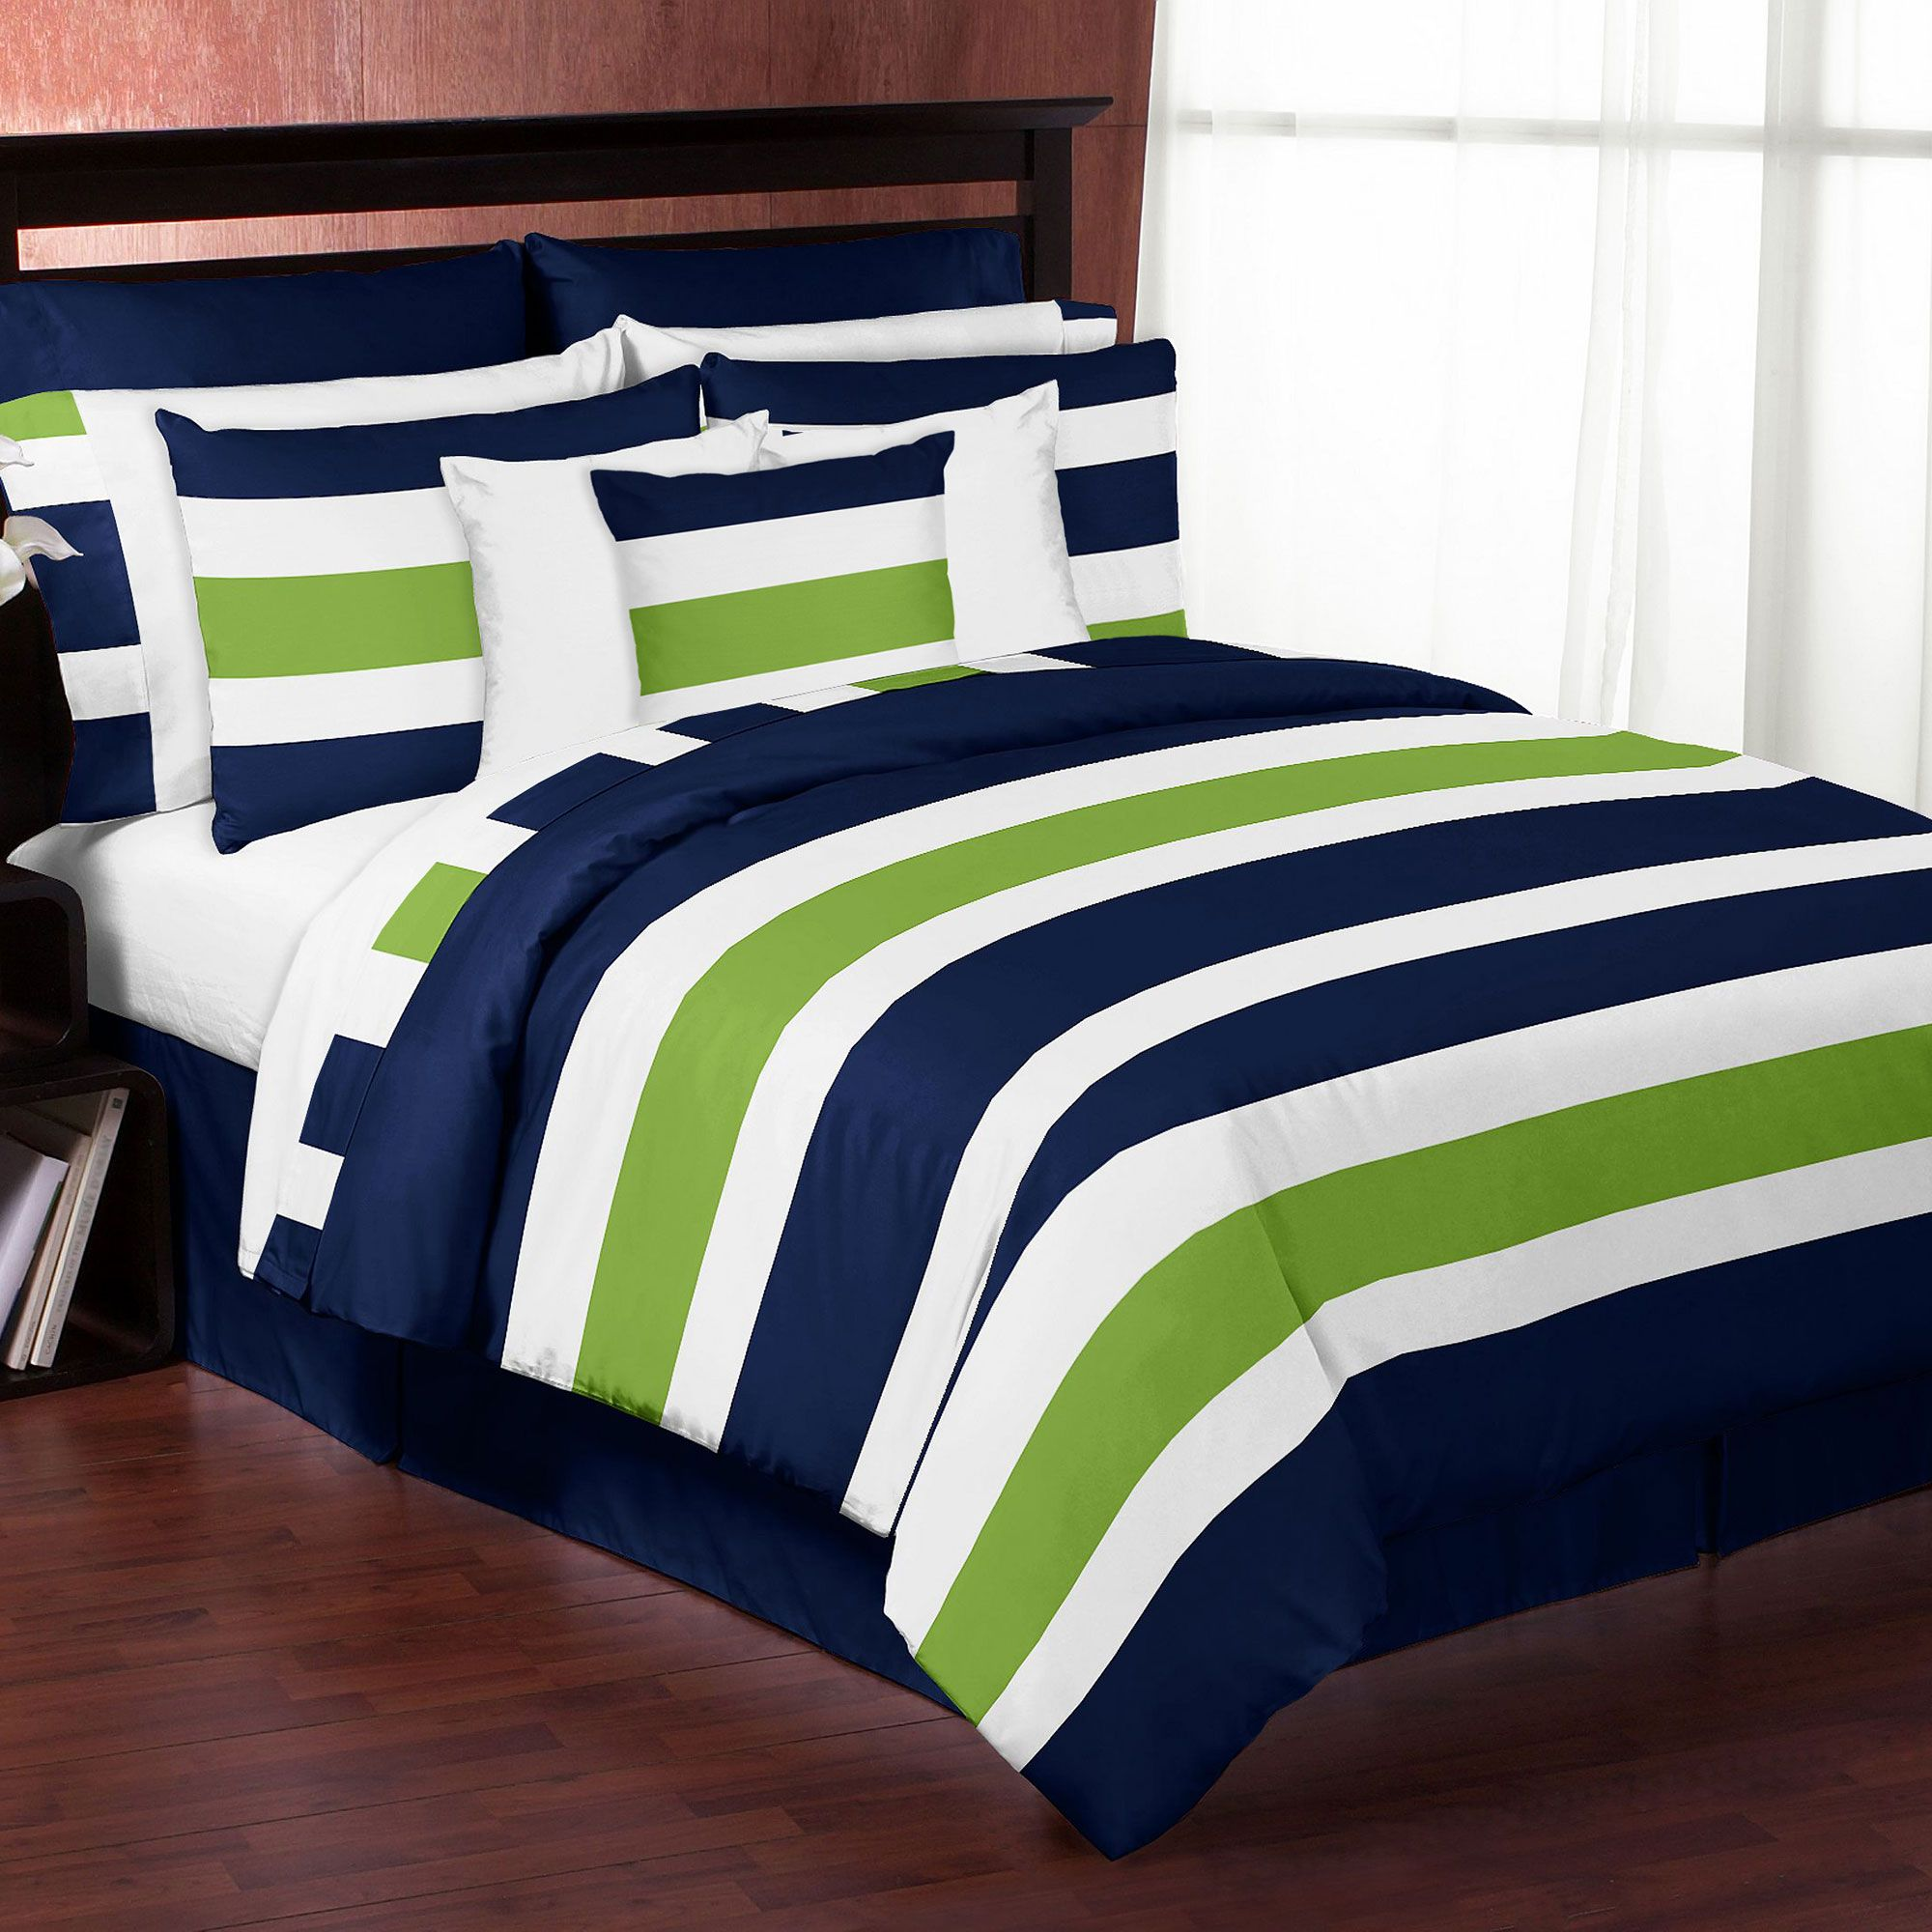 Stripe Navy Lime Bedding By Sweet Jojo Designs Love This Idea